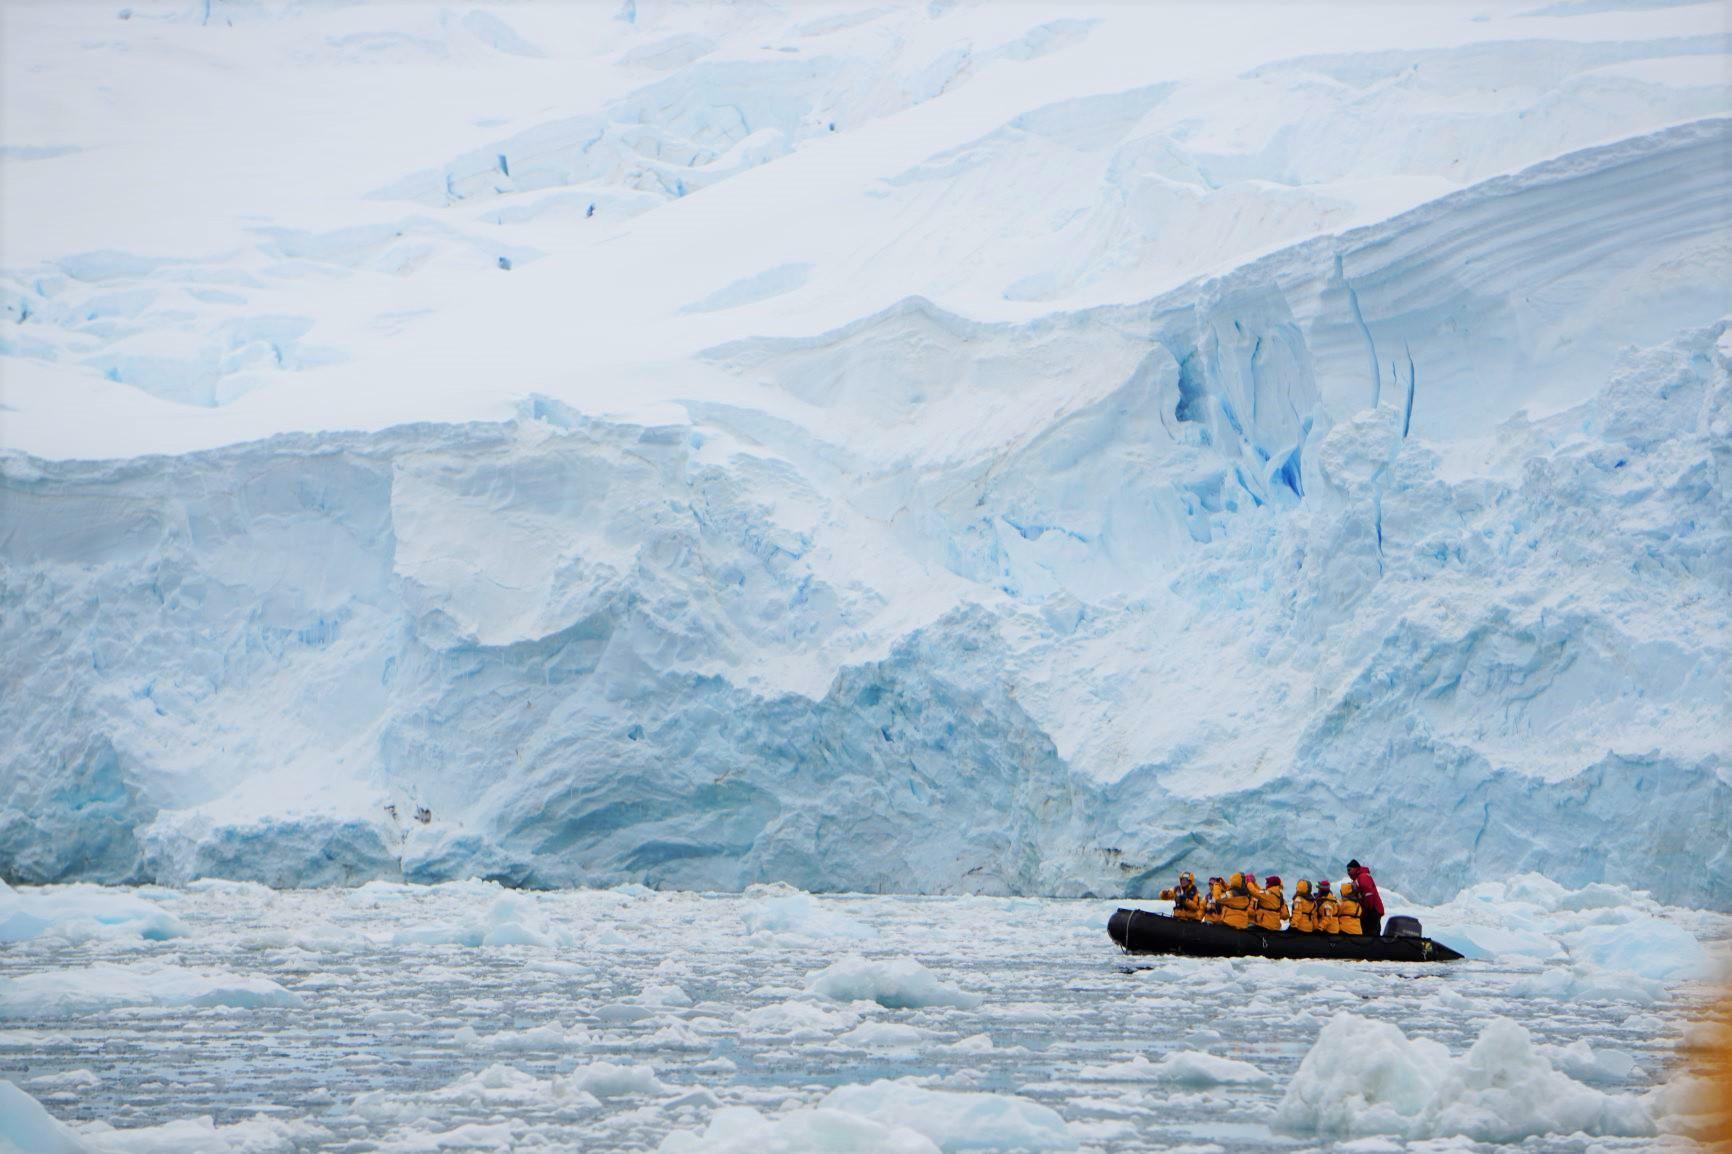 12月7日出発「南極半島探検クルーズ 16日間」